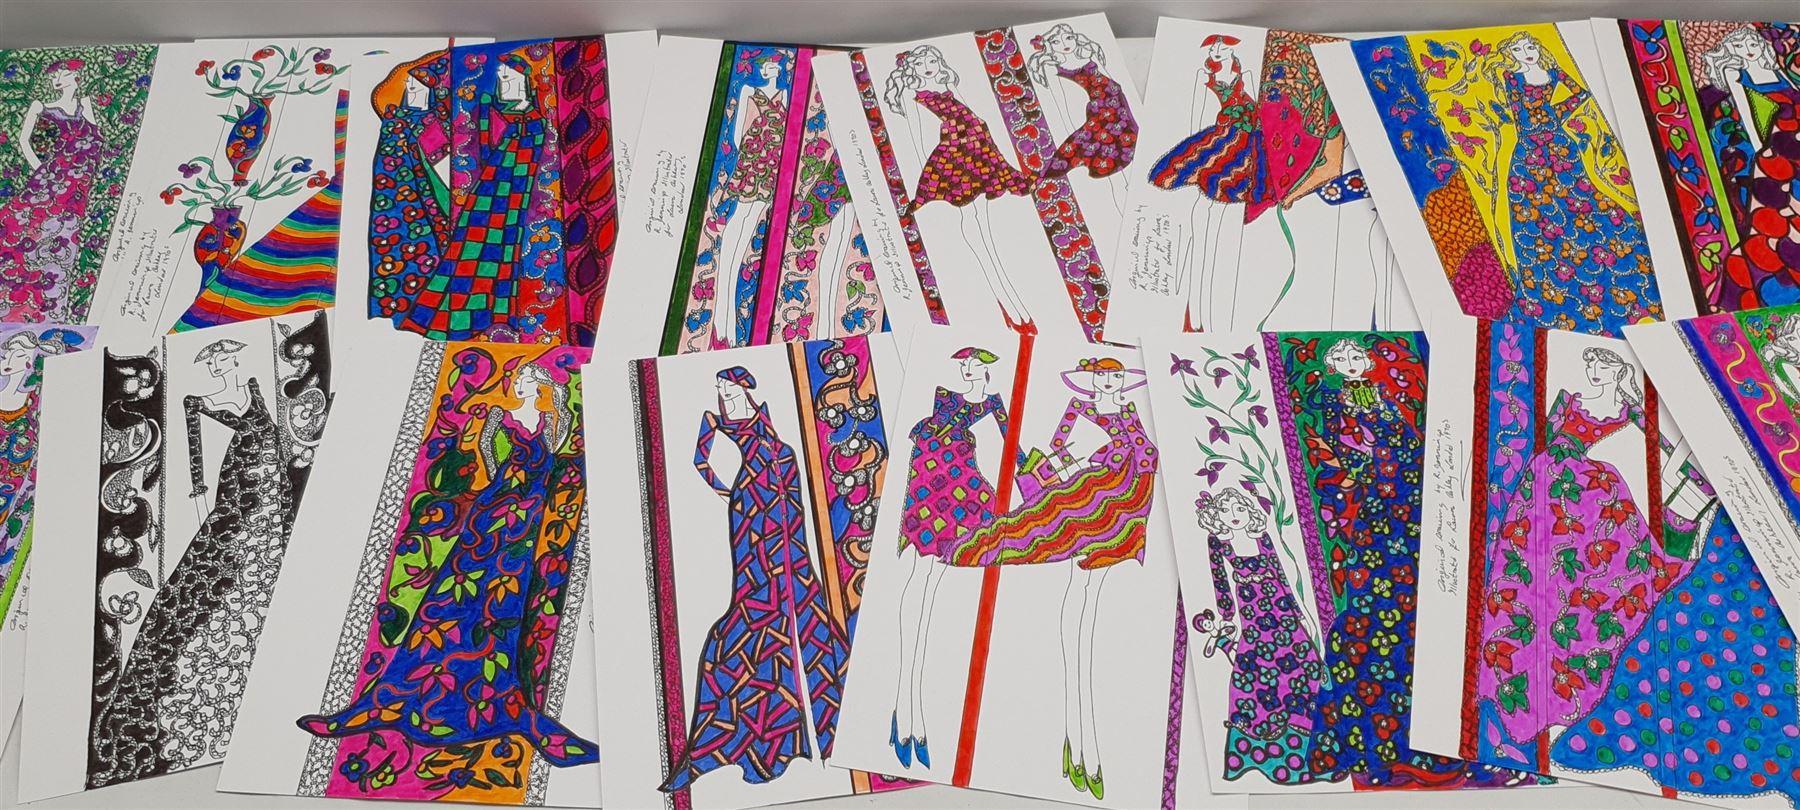 Roz Jennings (British Contemporary): Fashion Illustrations